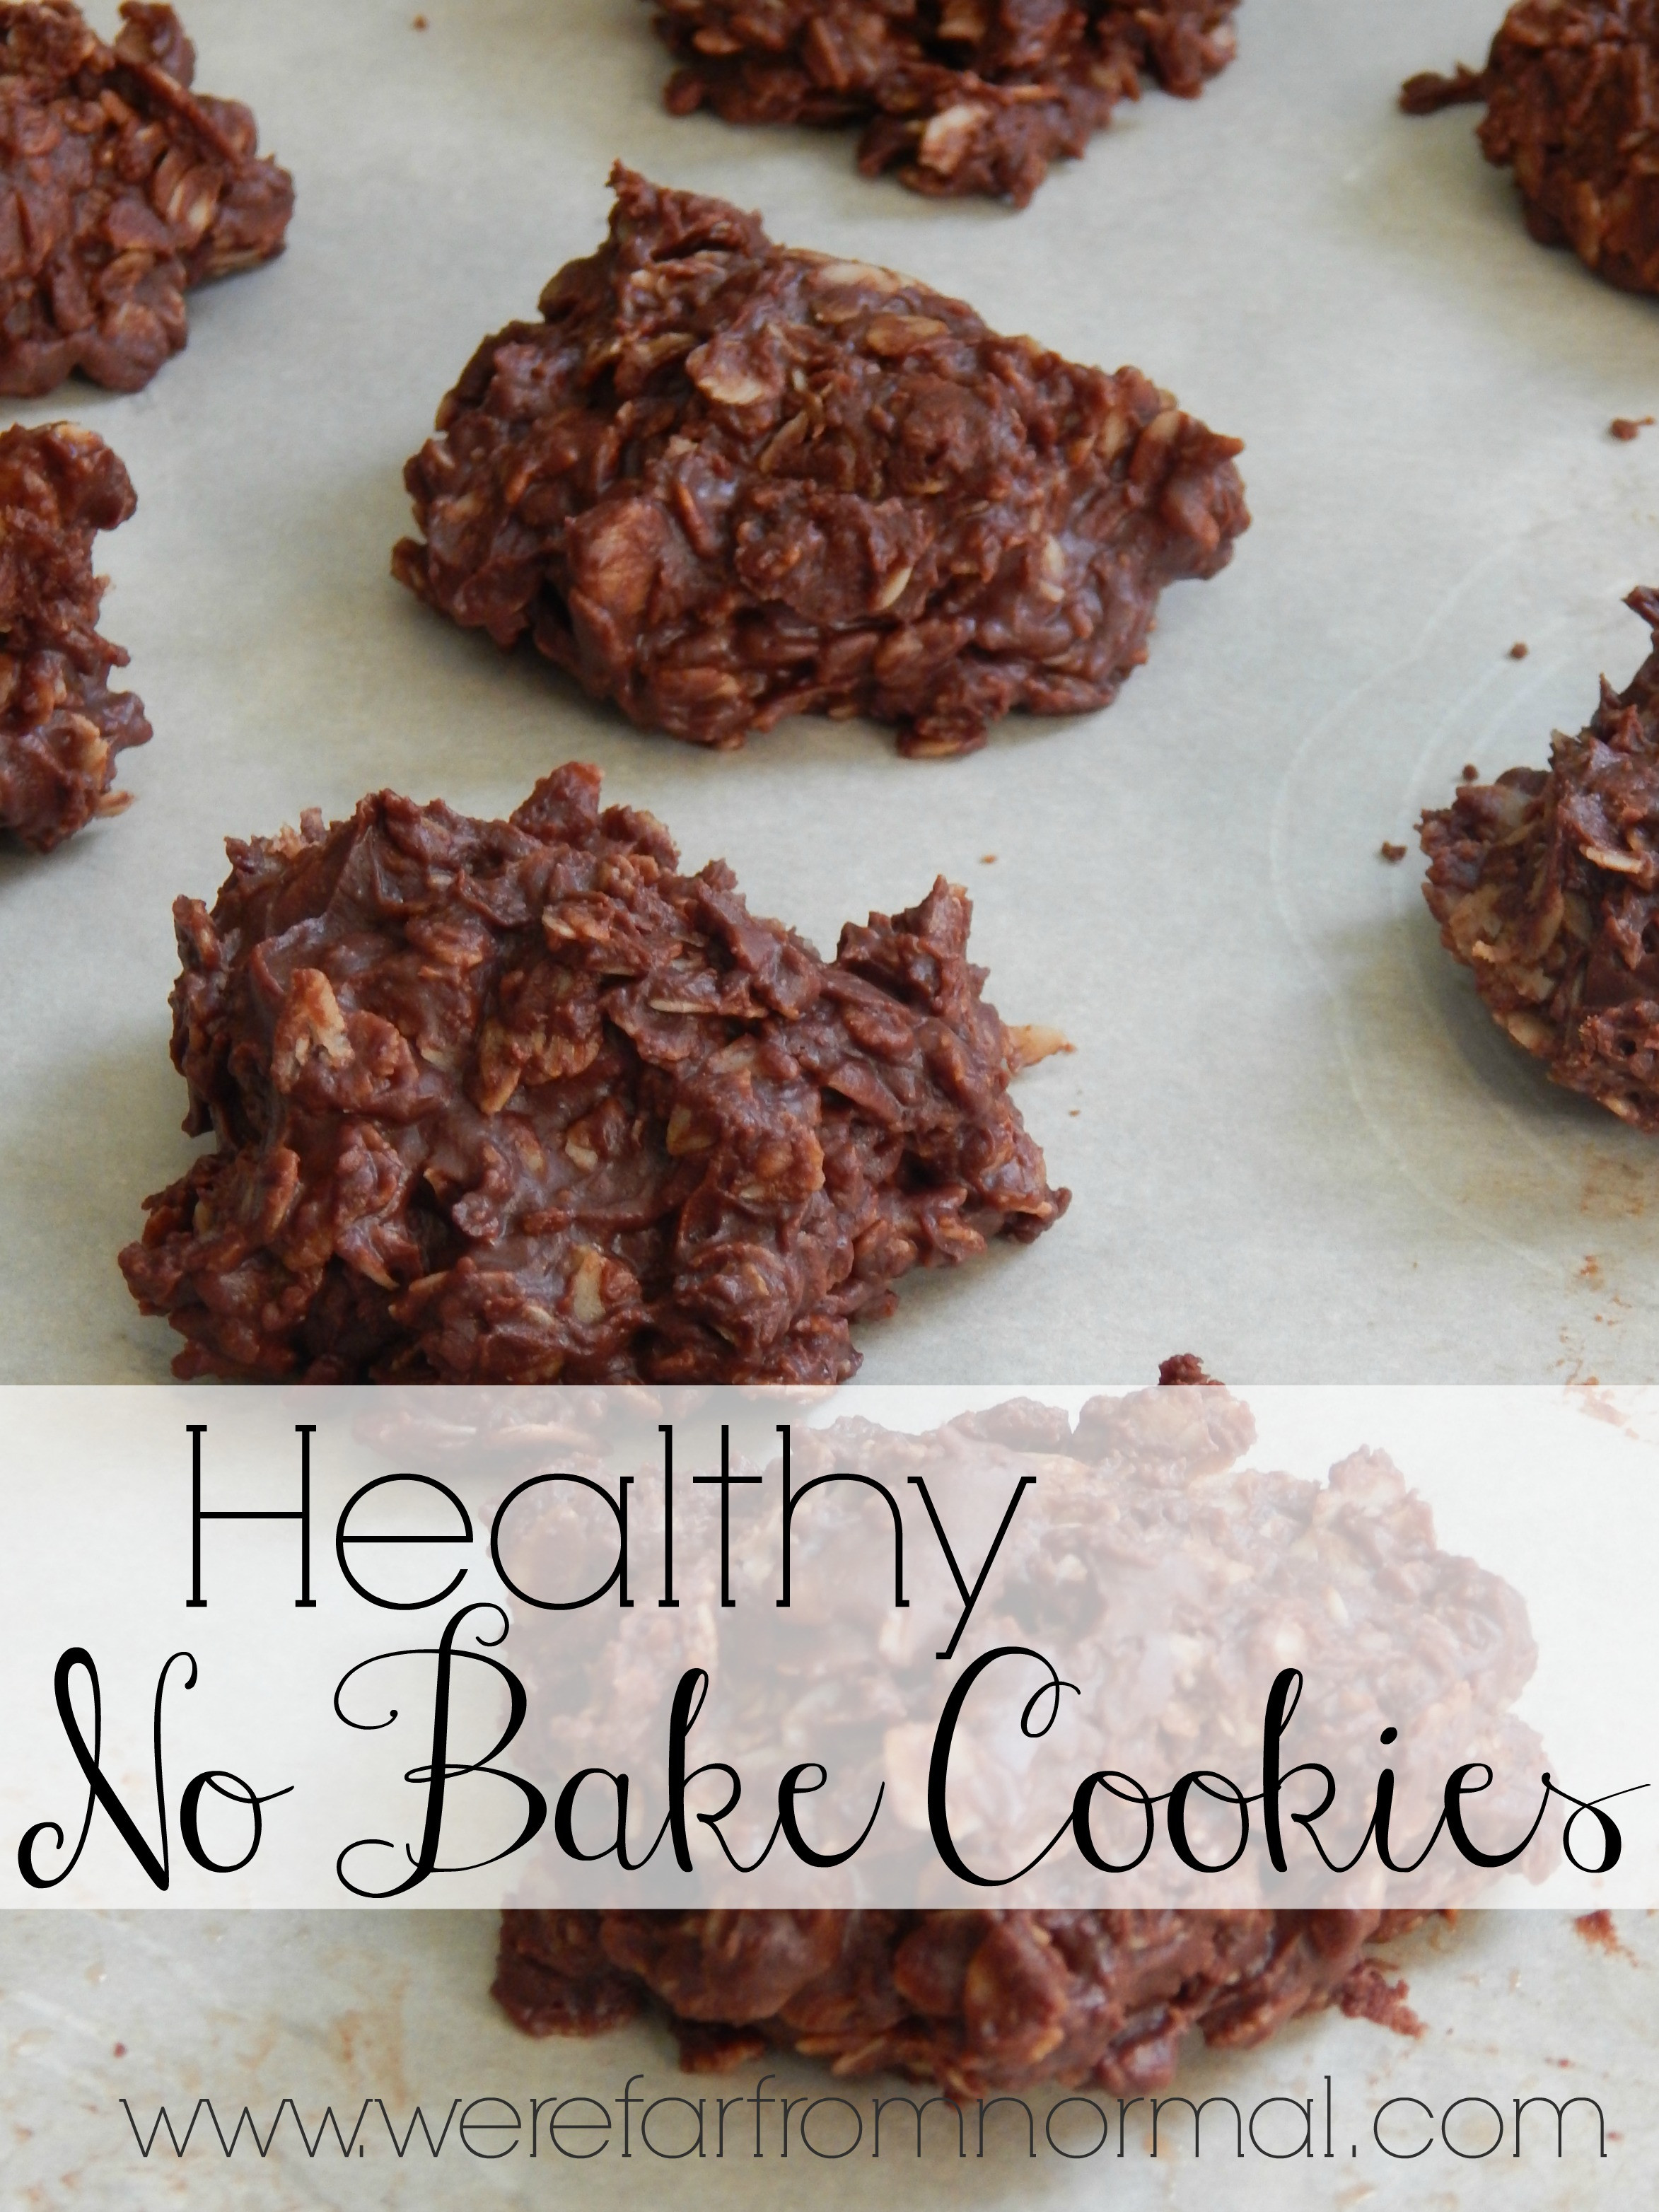 No Bake Cookies Healthy  Healthy Chocolate Oatmeal No Bake Cookies